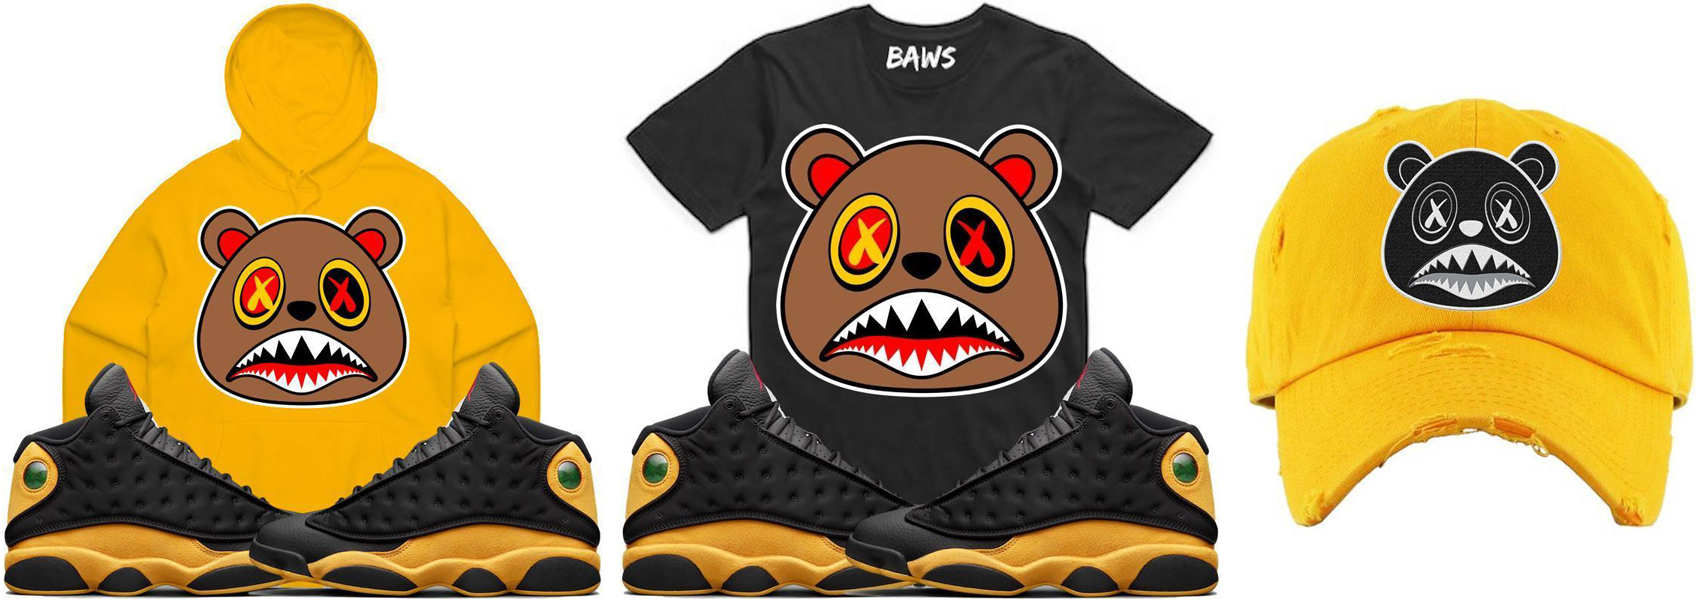 "f0a410255f0d4f Air Jordan 13 Melo ""Class of 2002"" x BAWS Sneaker Shirts"